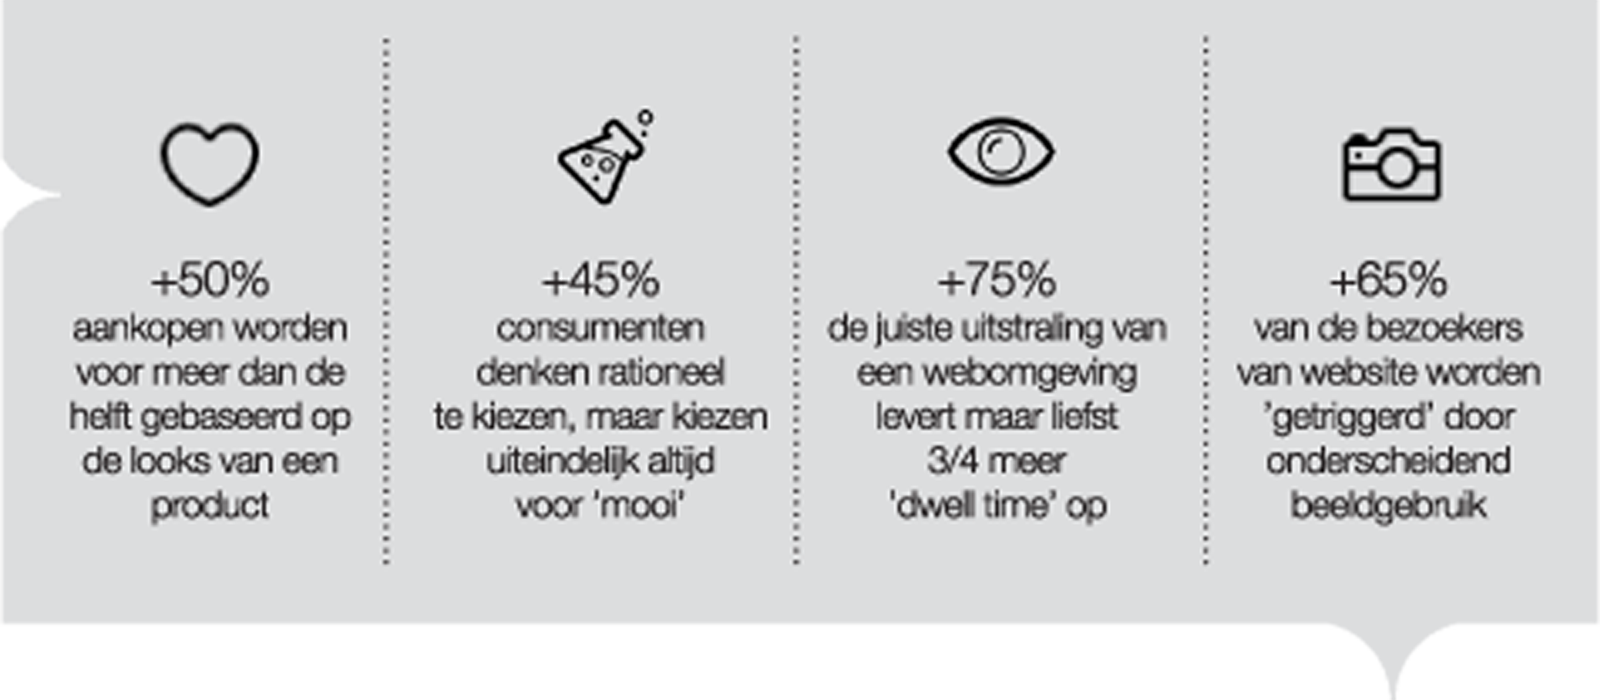 zomerinhuis.nlcommunicatie+score_design_impact